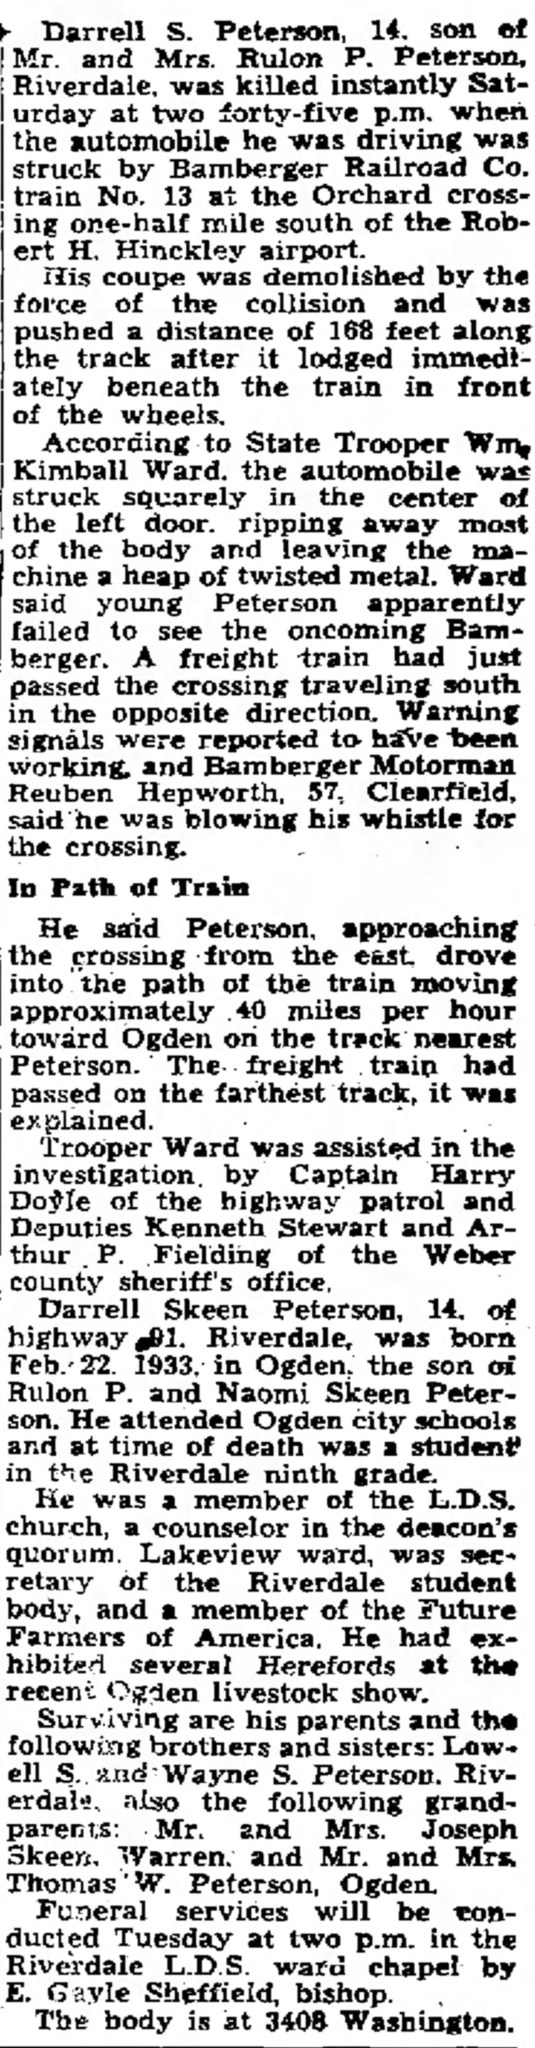 PETERSON, Darrell Skeen, accident, first article, main part, The Ogden Standard Examiner Sun Nov 23 1947